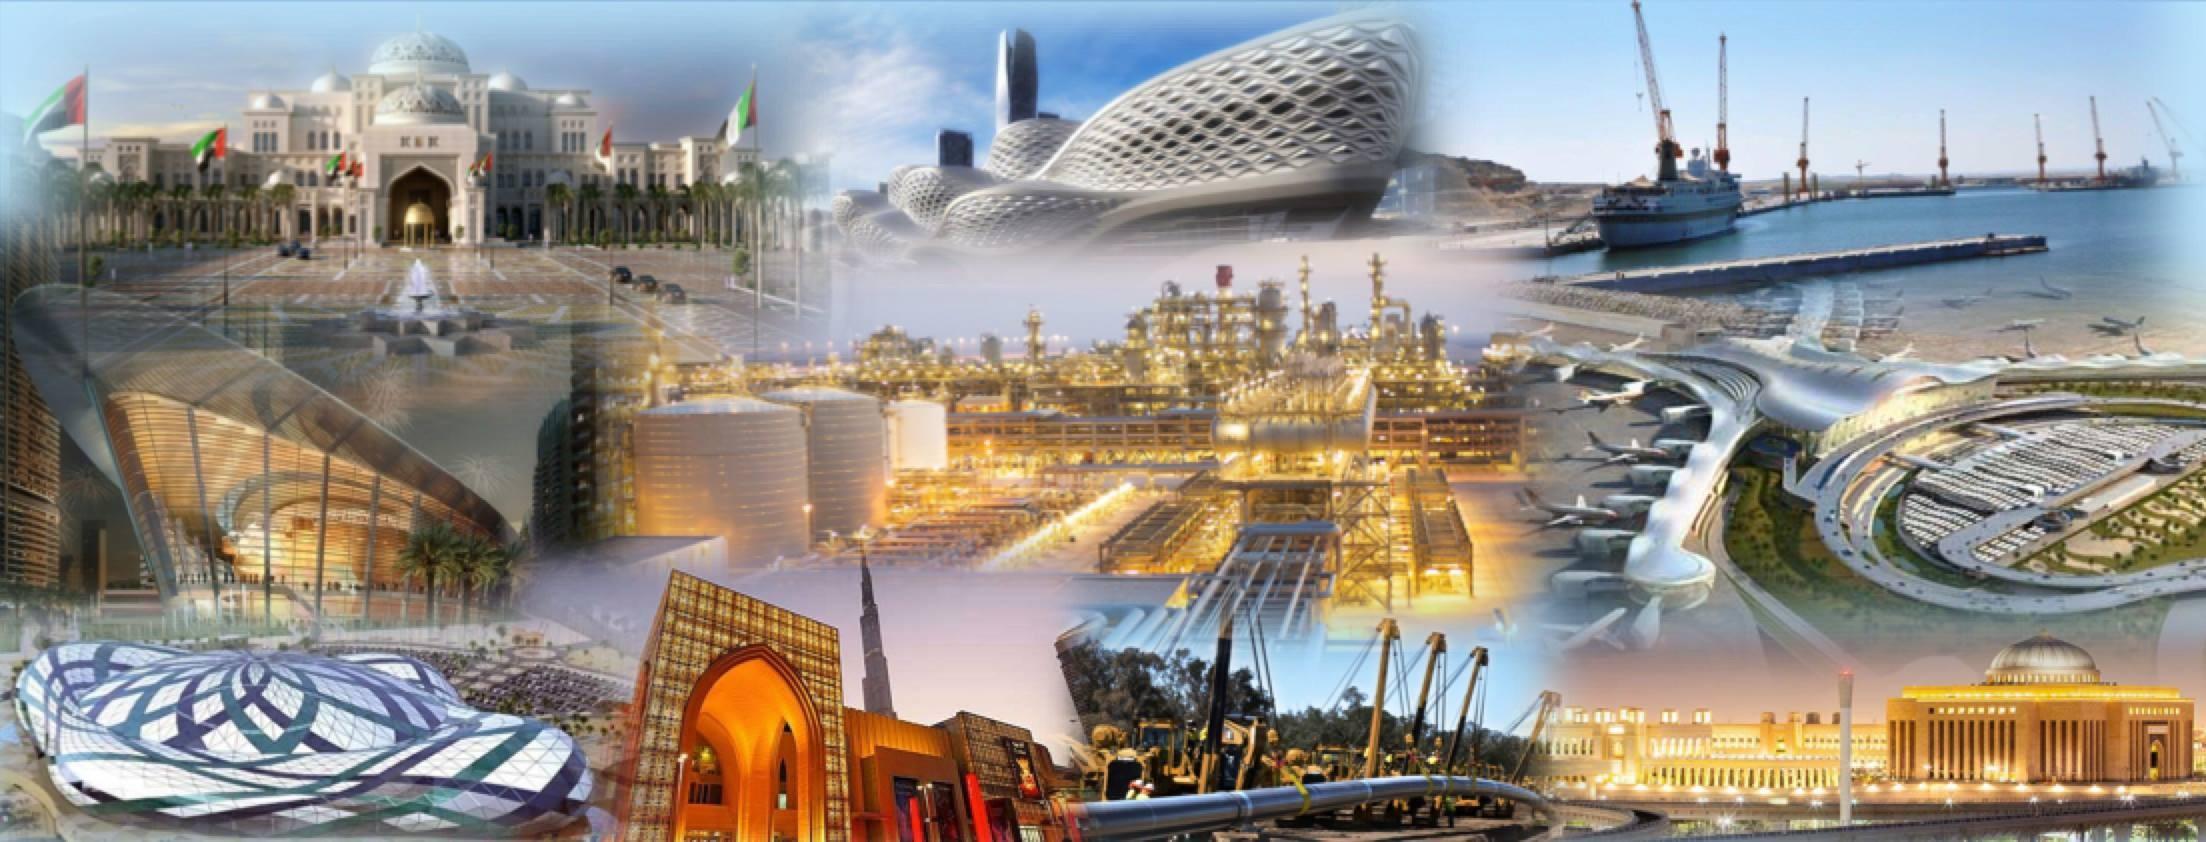 Consolidated Contractors International Company | LinkedIn